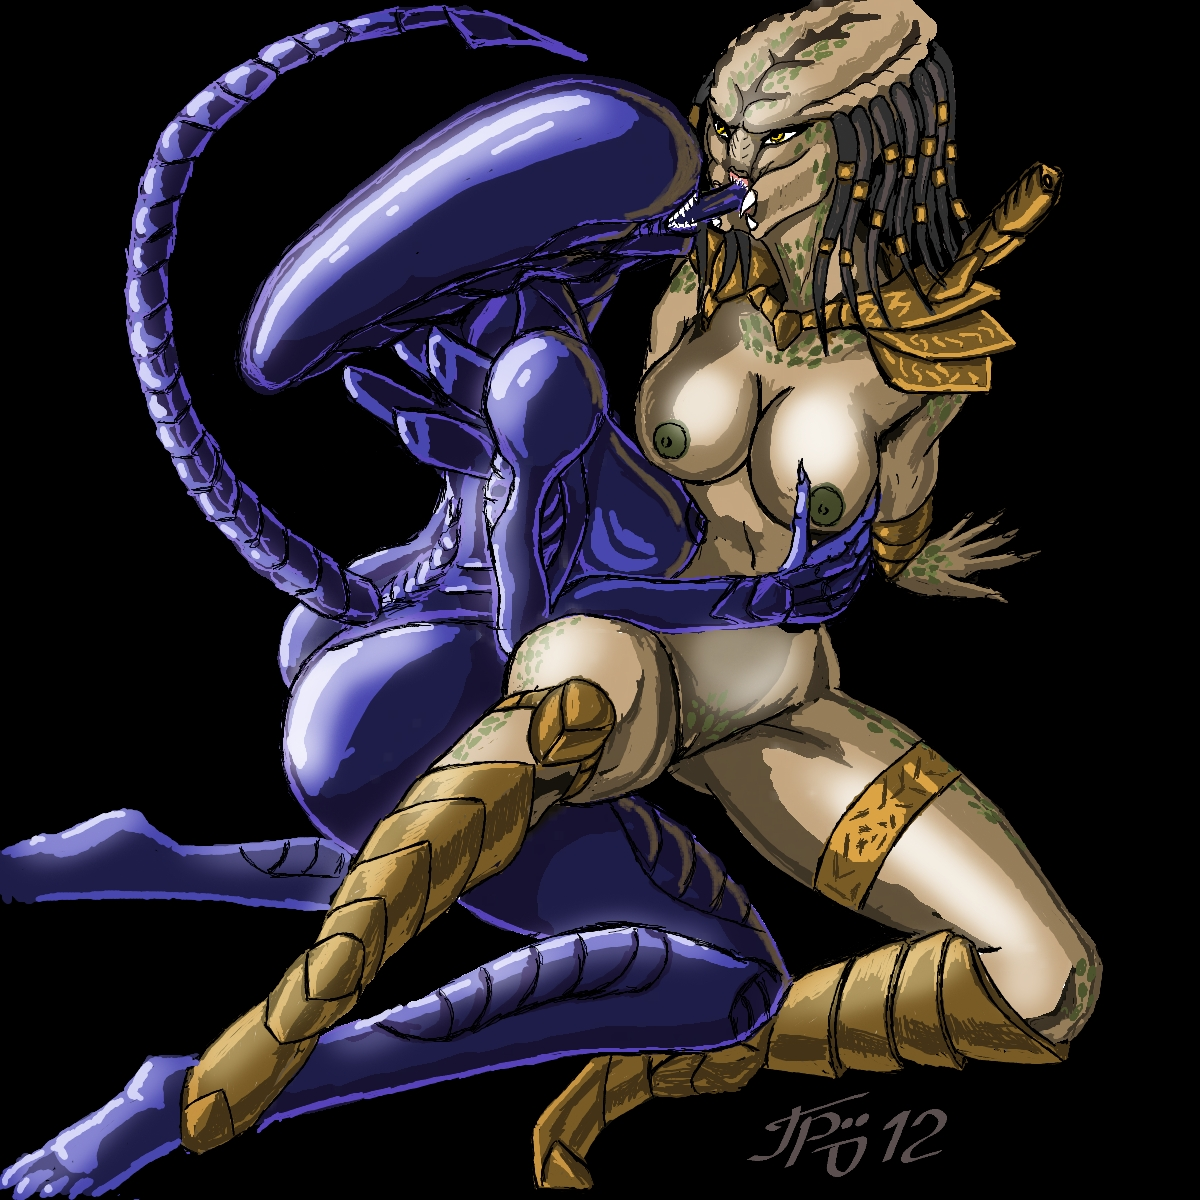 Gay Alien Porn Monster - alien forced search - MegaPornX